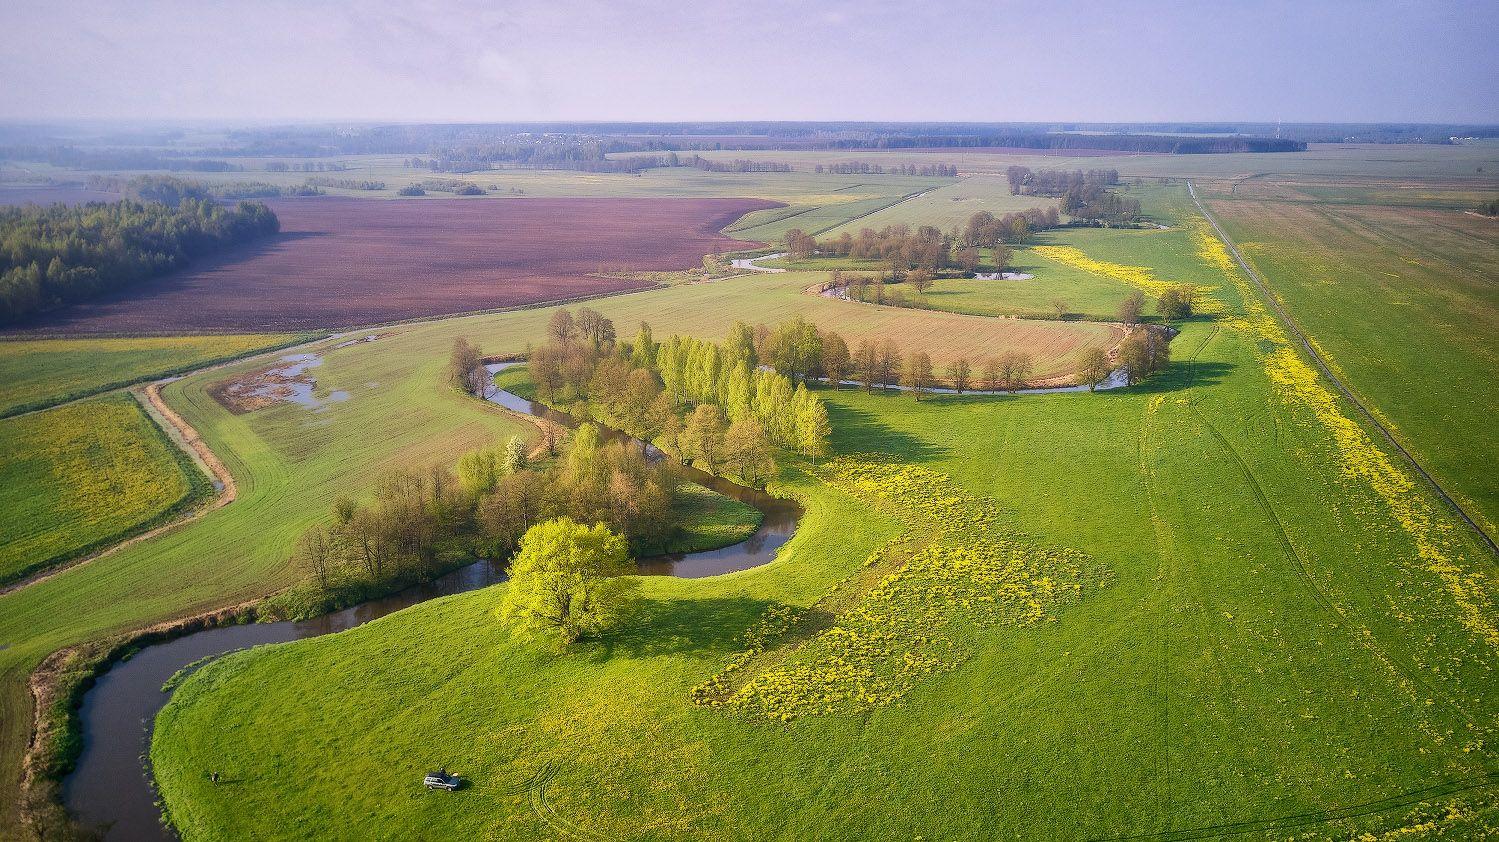 Весна пришла Беларусь Весна Май Поля Рассвет Река Уса Утро